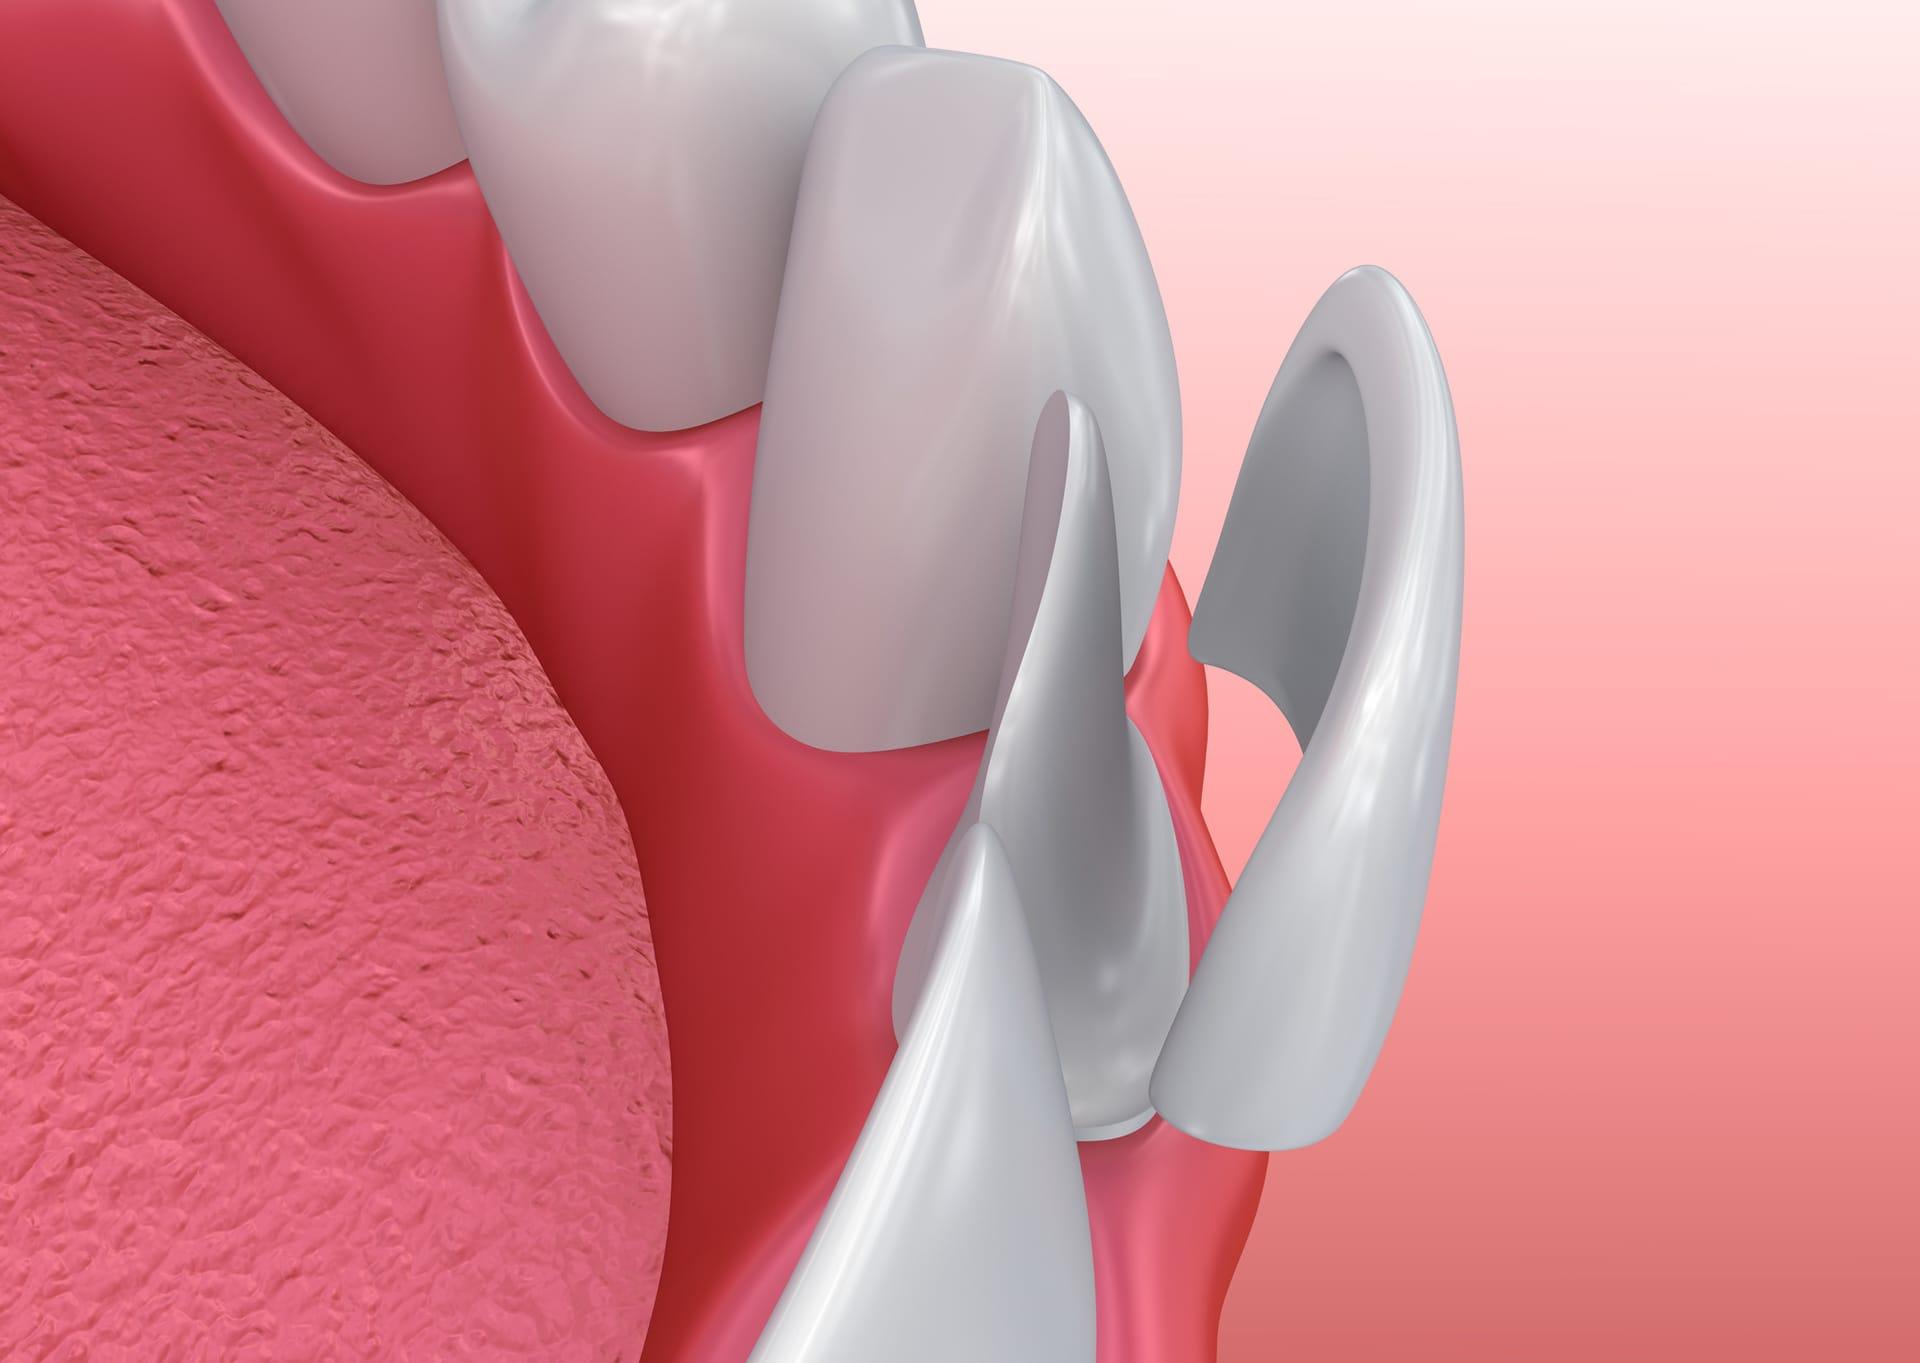 painless dentist